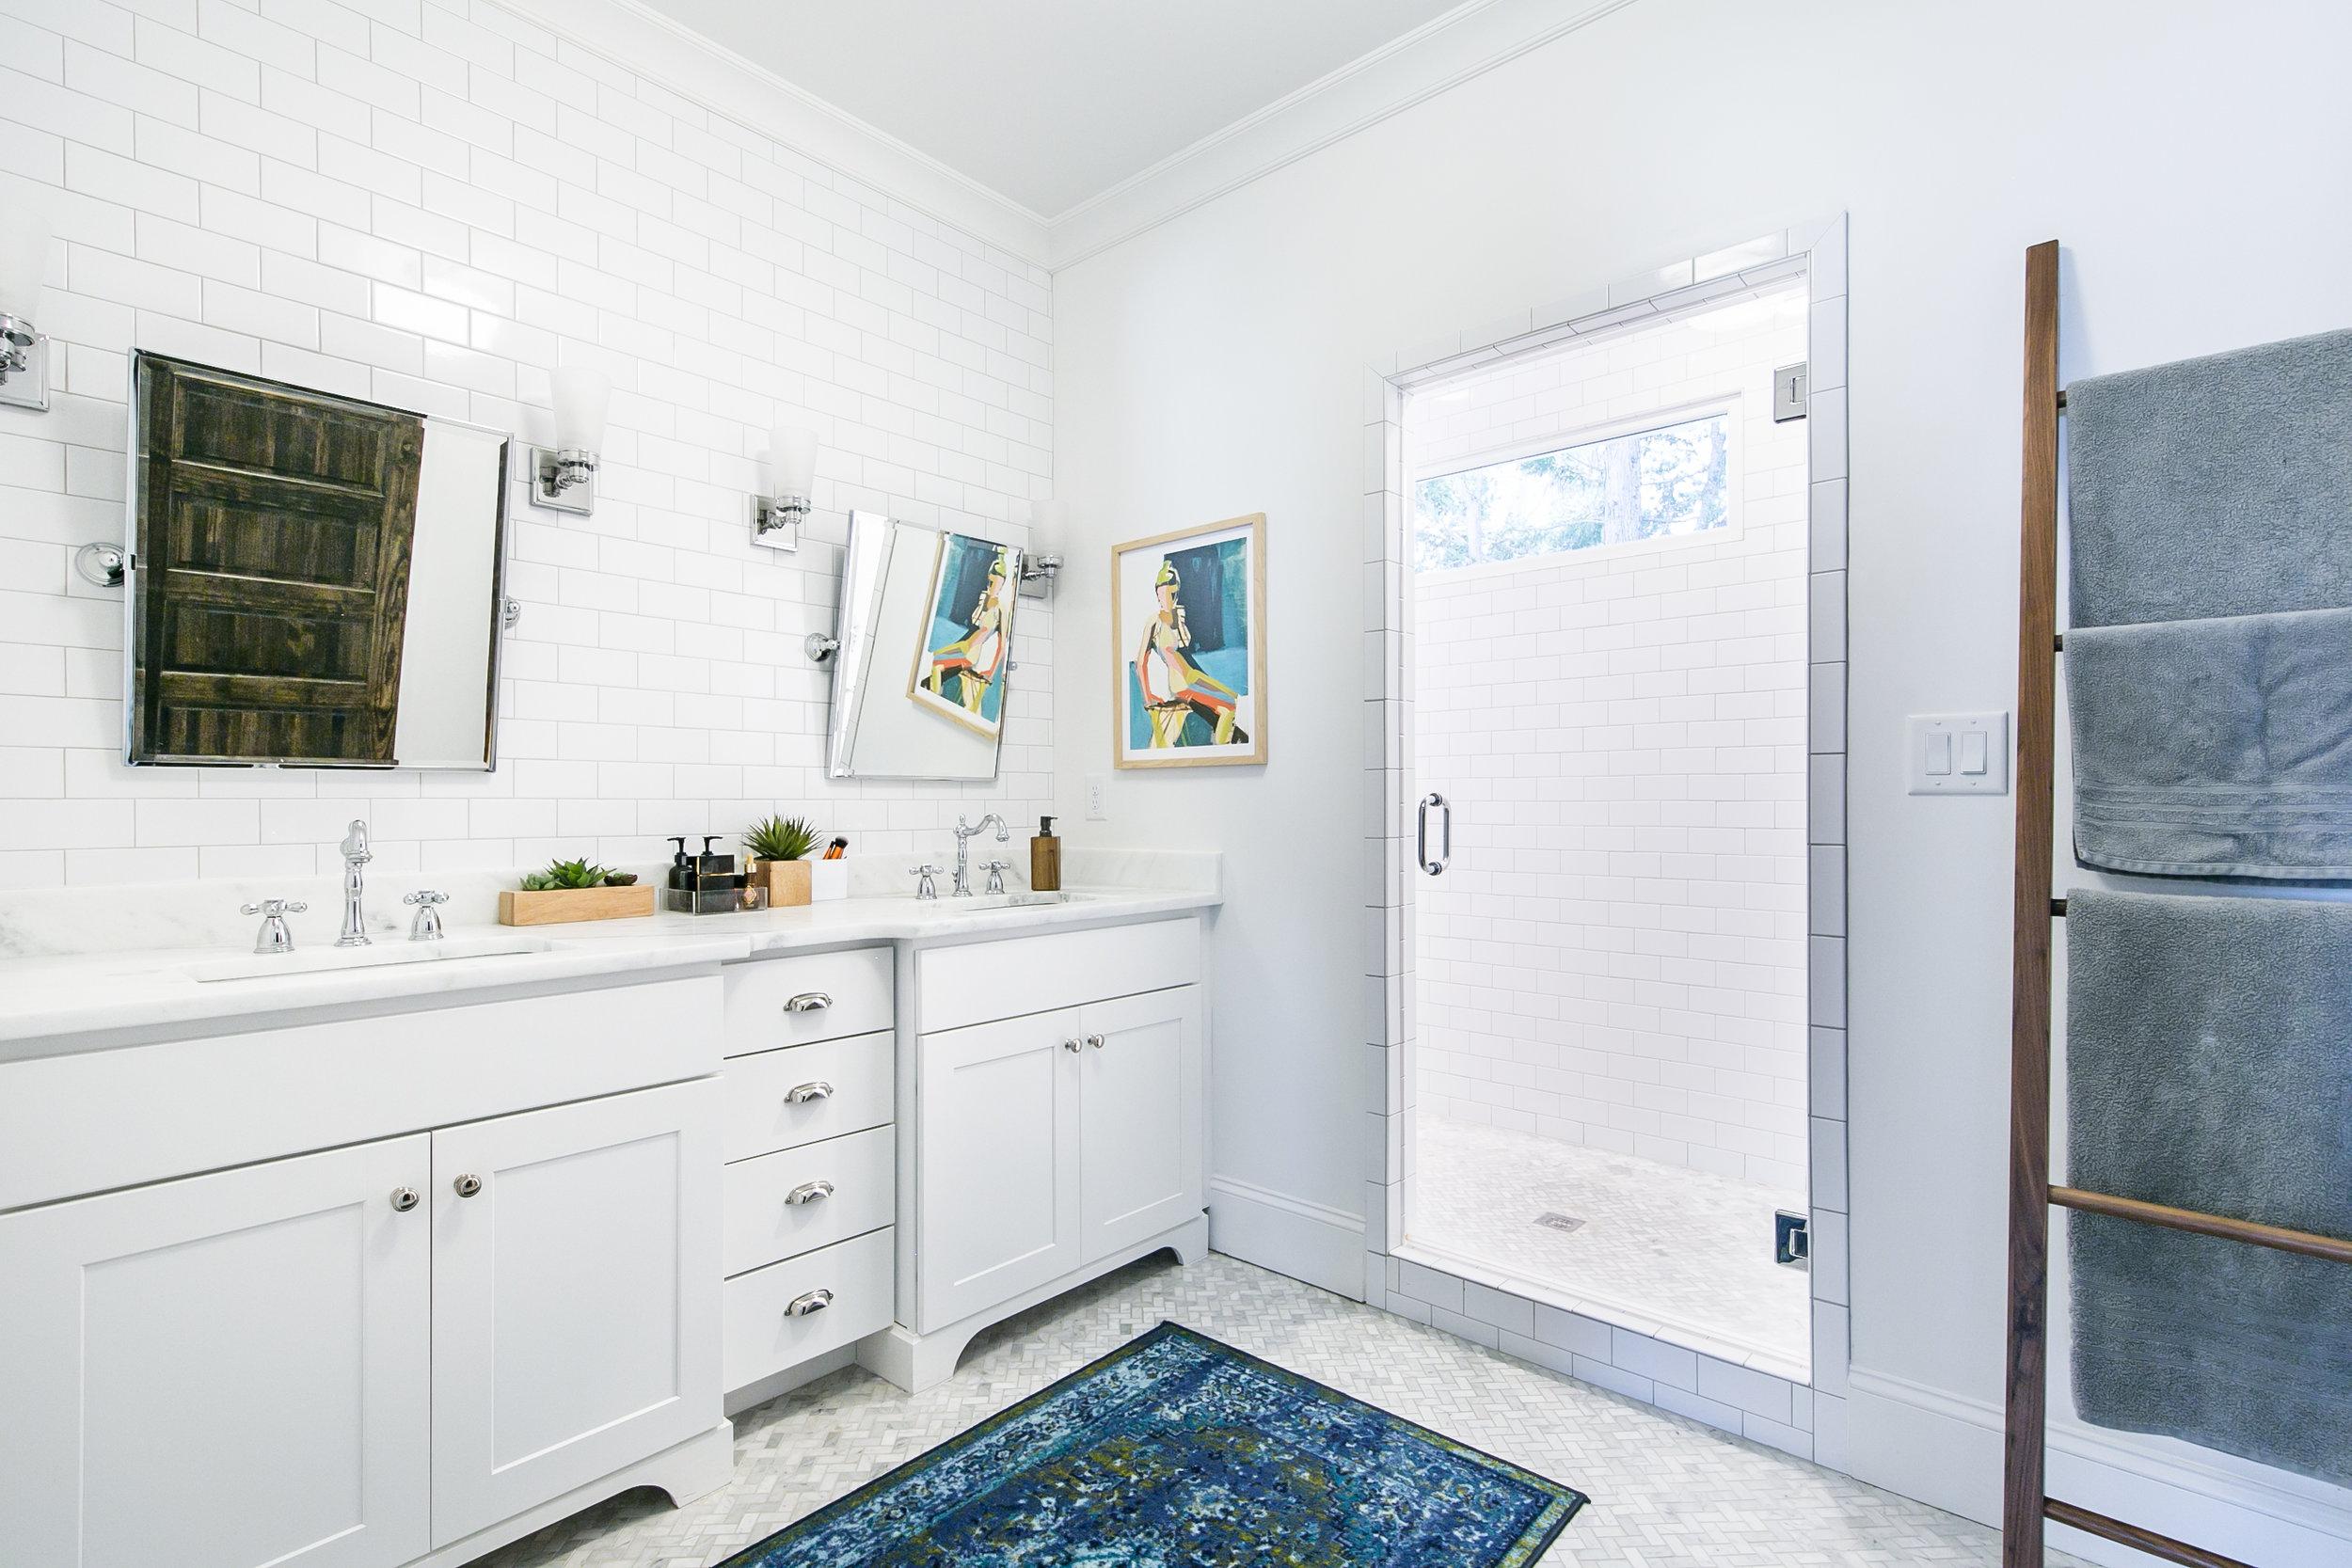 239 Greenwood-Master bath.jpg